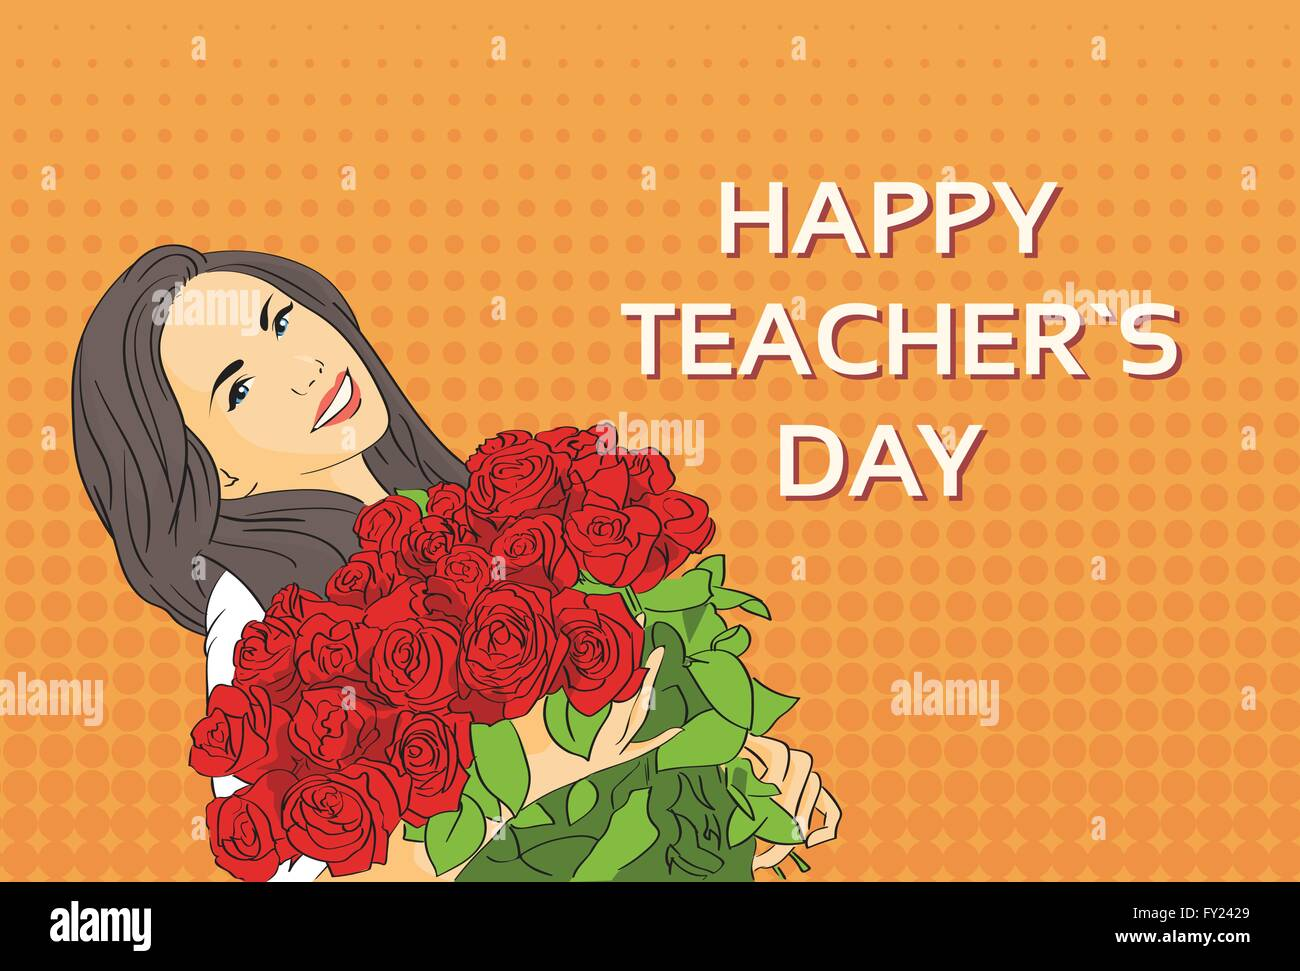 Woman hold rose flower bouquet teacher day holiday greeting card pop woman hold rose flower bouquet teacher day holiday greeting card pop art colorful retro style m4hsunfo